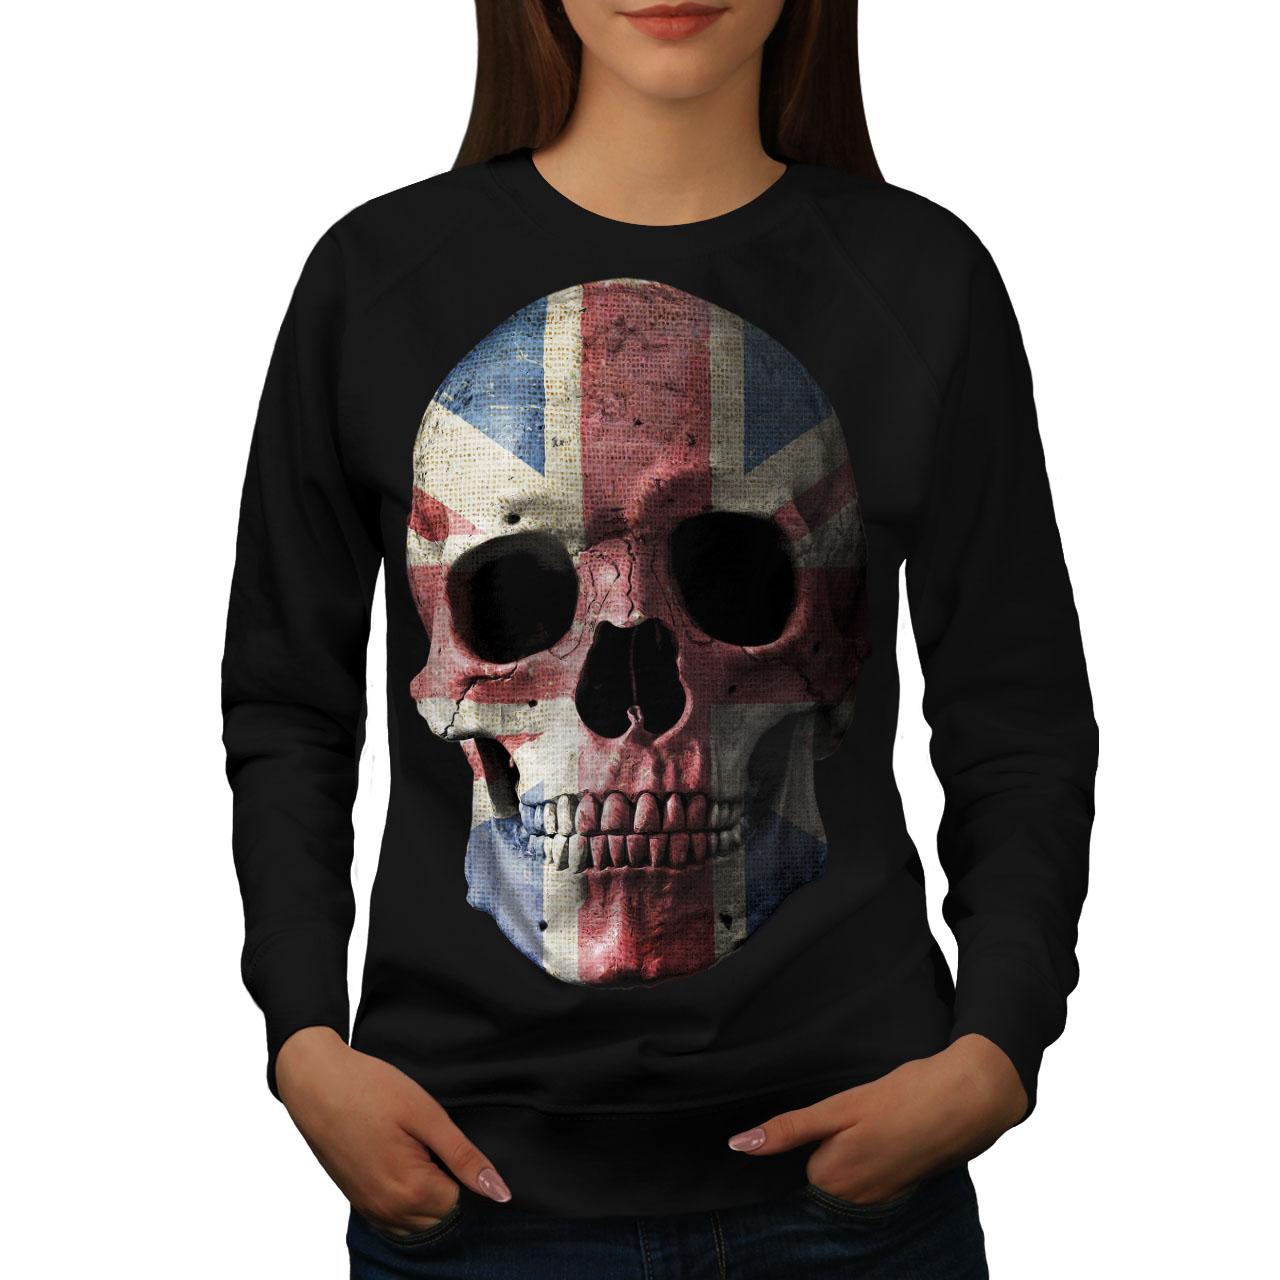 Wellcoda-British-Flag-Skull-Womens-Sweatshirt-Faded-Casual-Pullover-Jumper